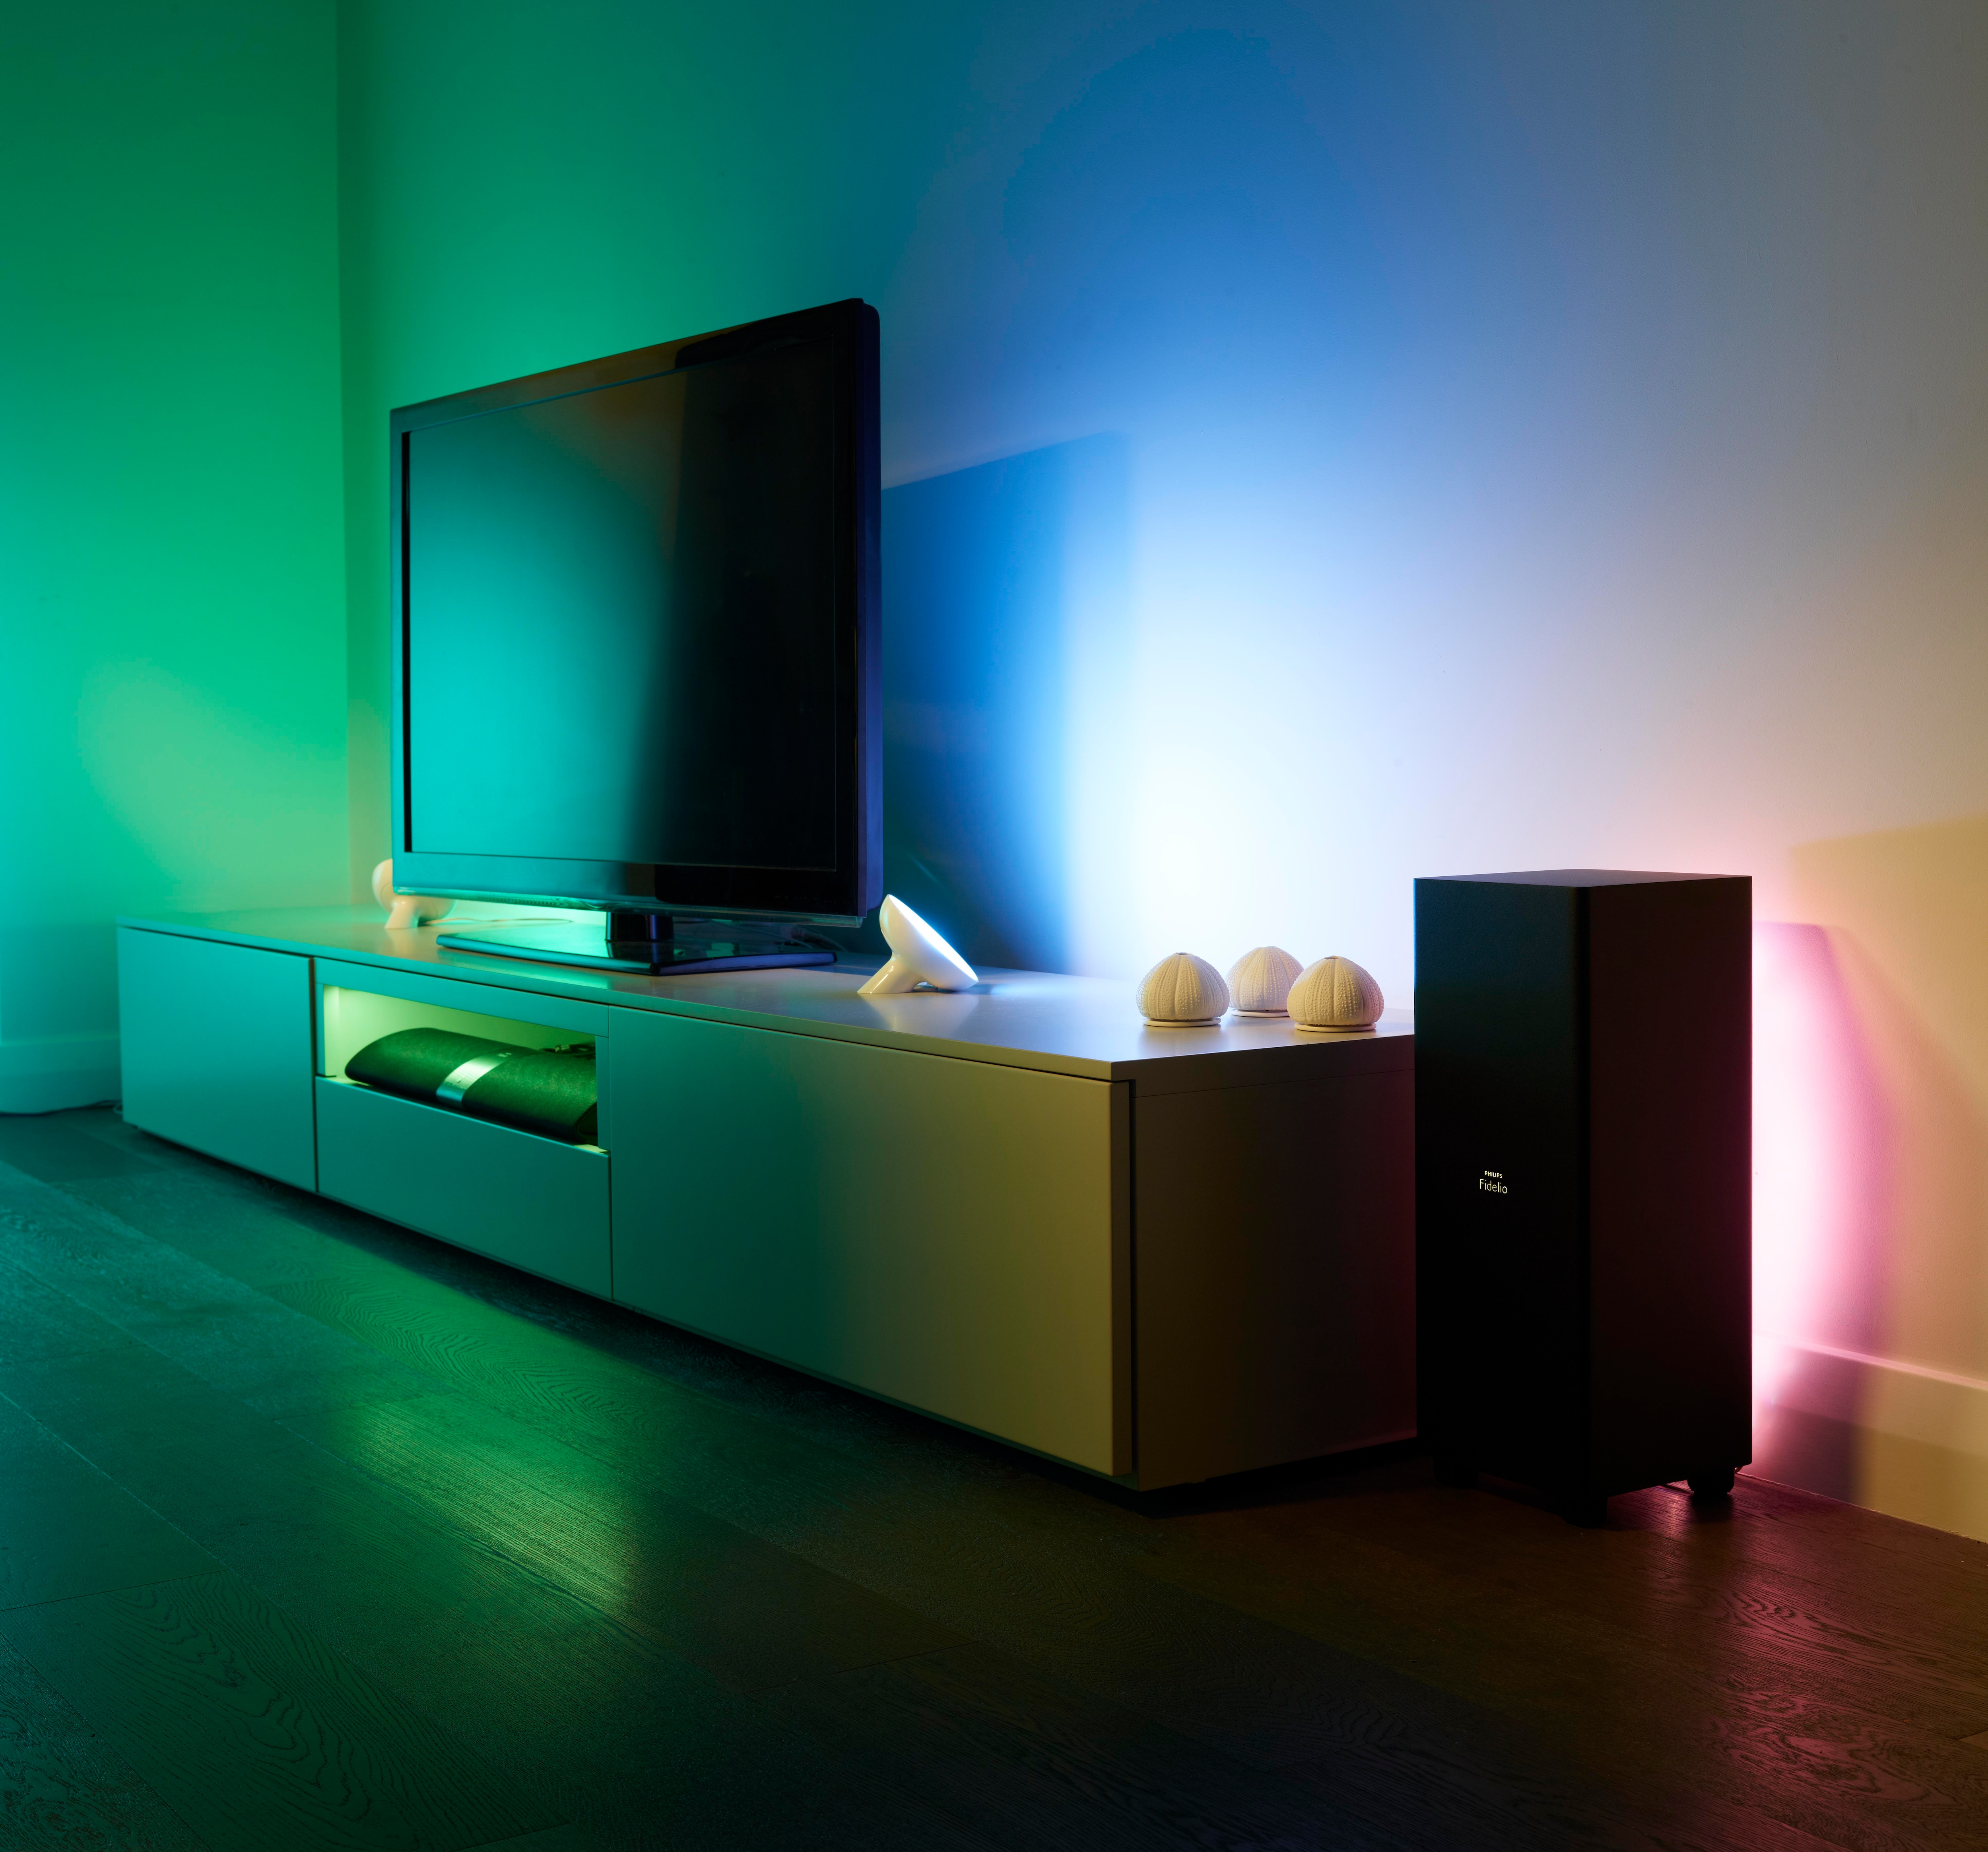 LivingColors-and-LightStrips-TV-Lifestyle Schöne Philips Friends Of Hue Lightstrips Dekorationen